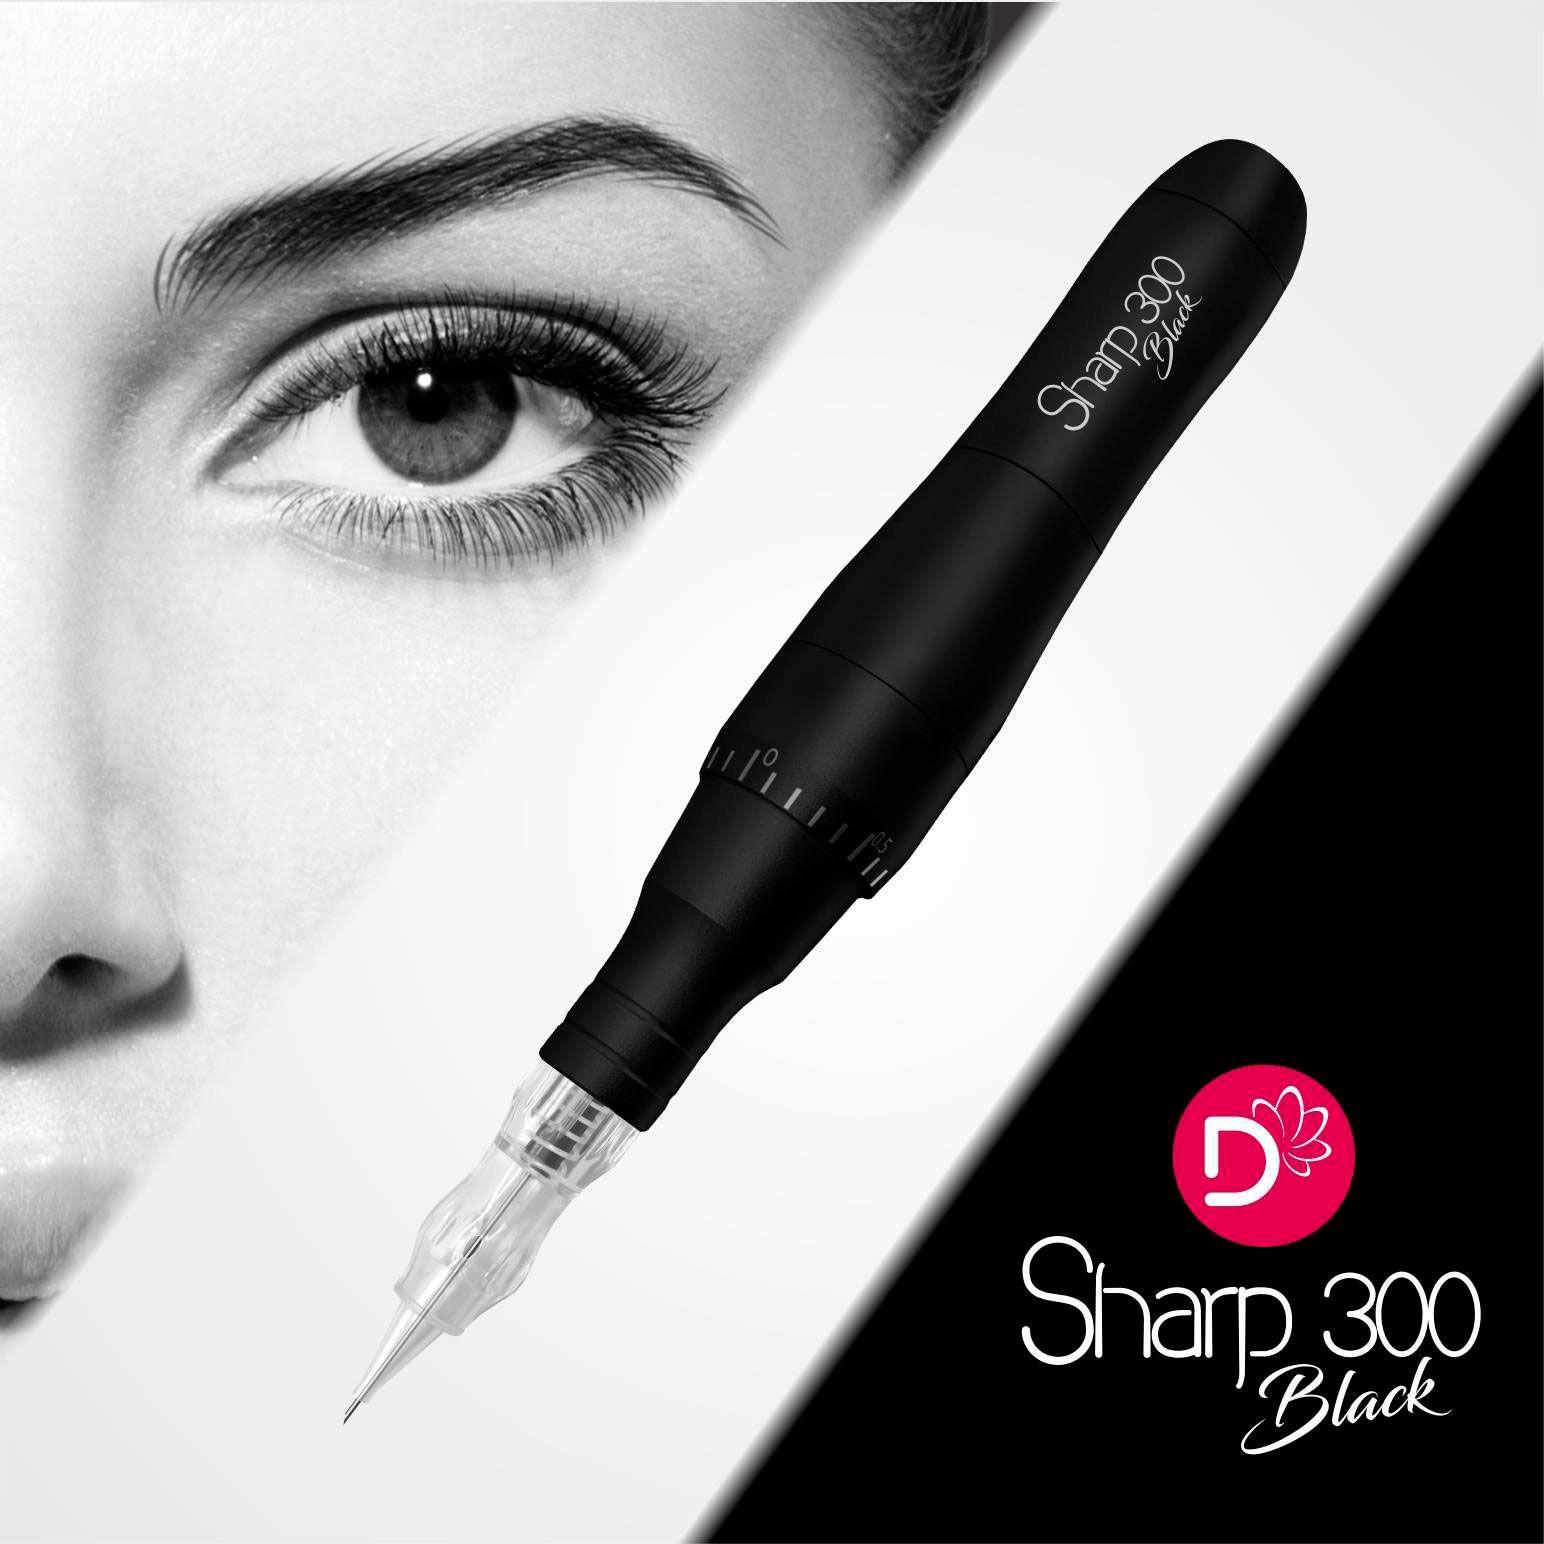 Dermografo Sharp 300 Black Caneta Avulso